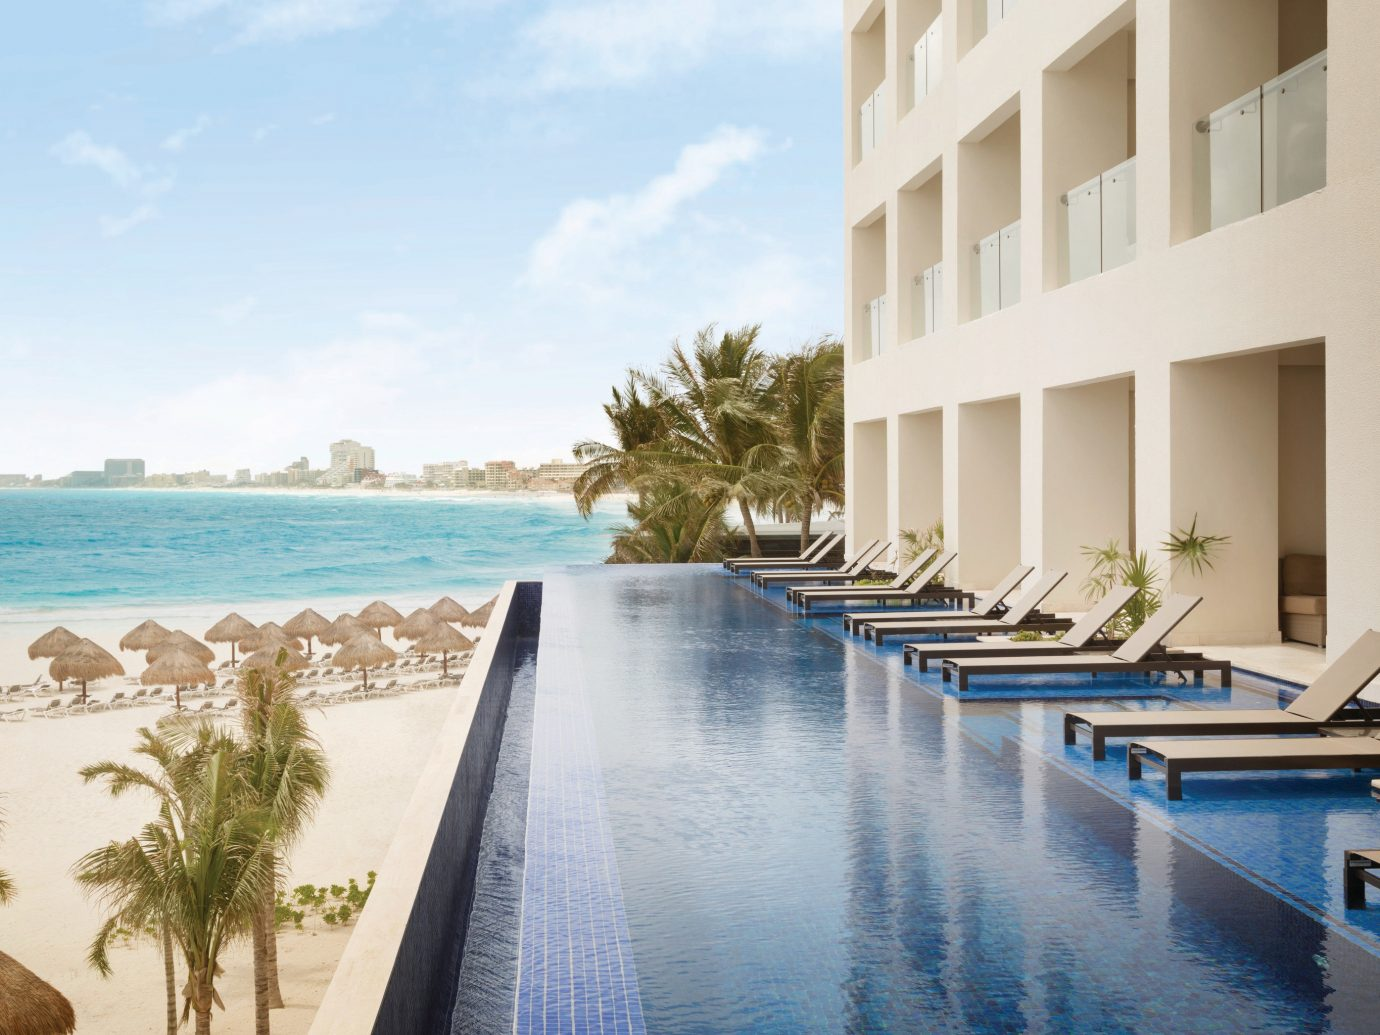 Pool at Hyatt Ziva Cancun